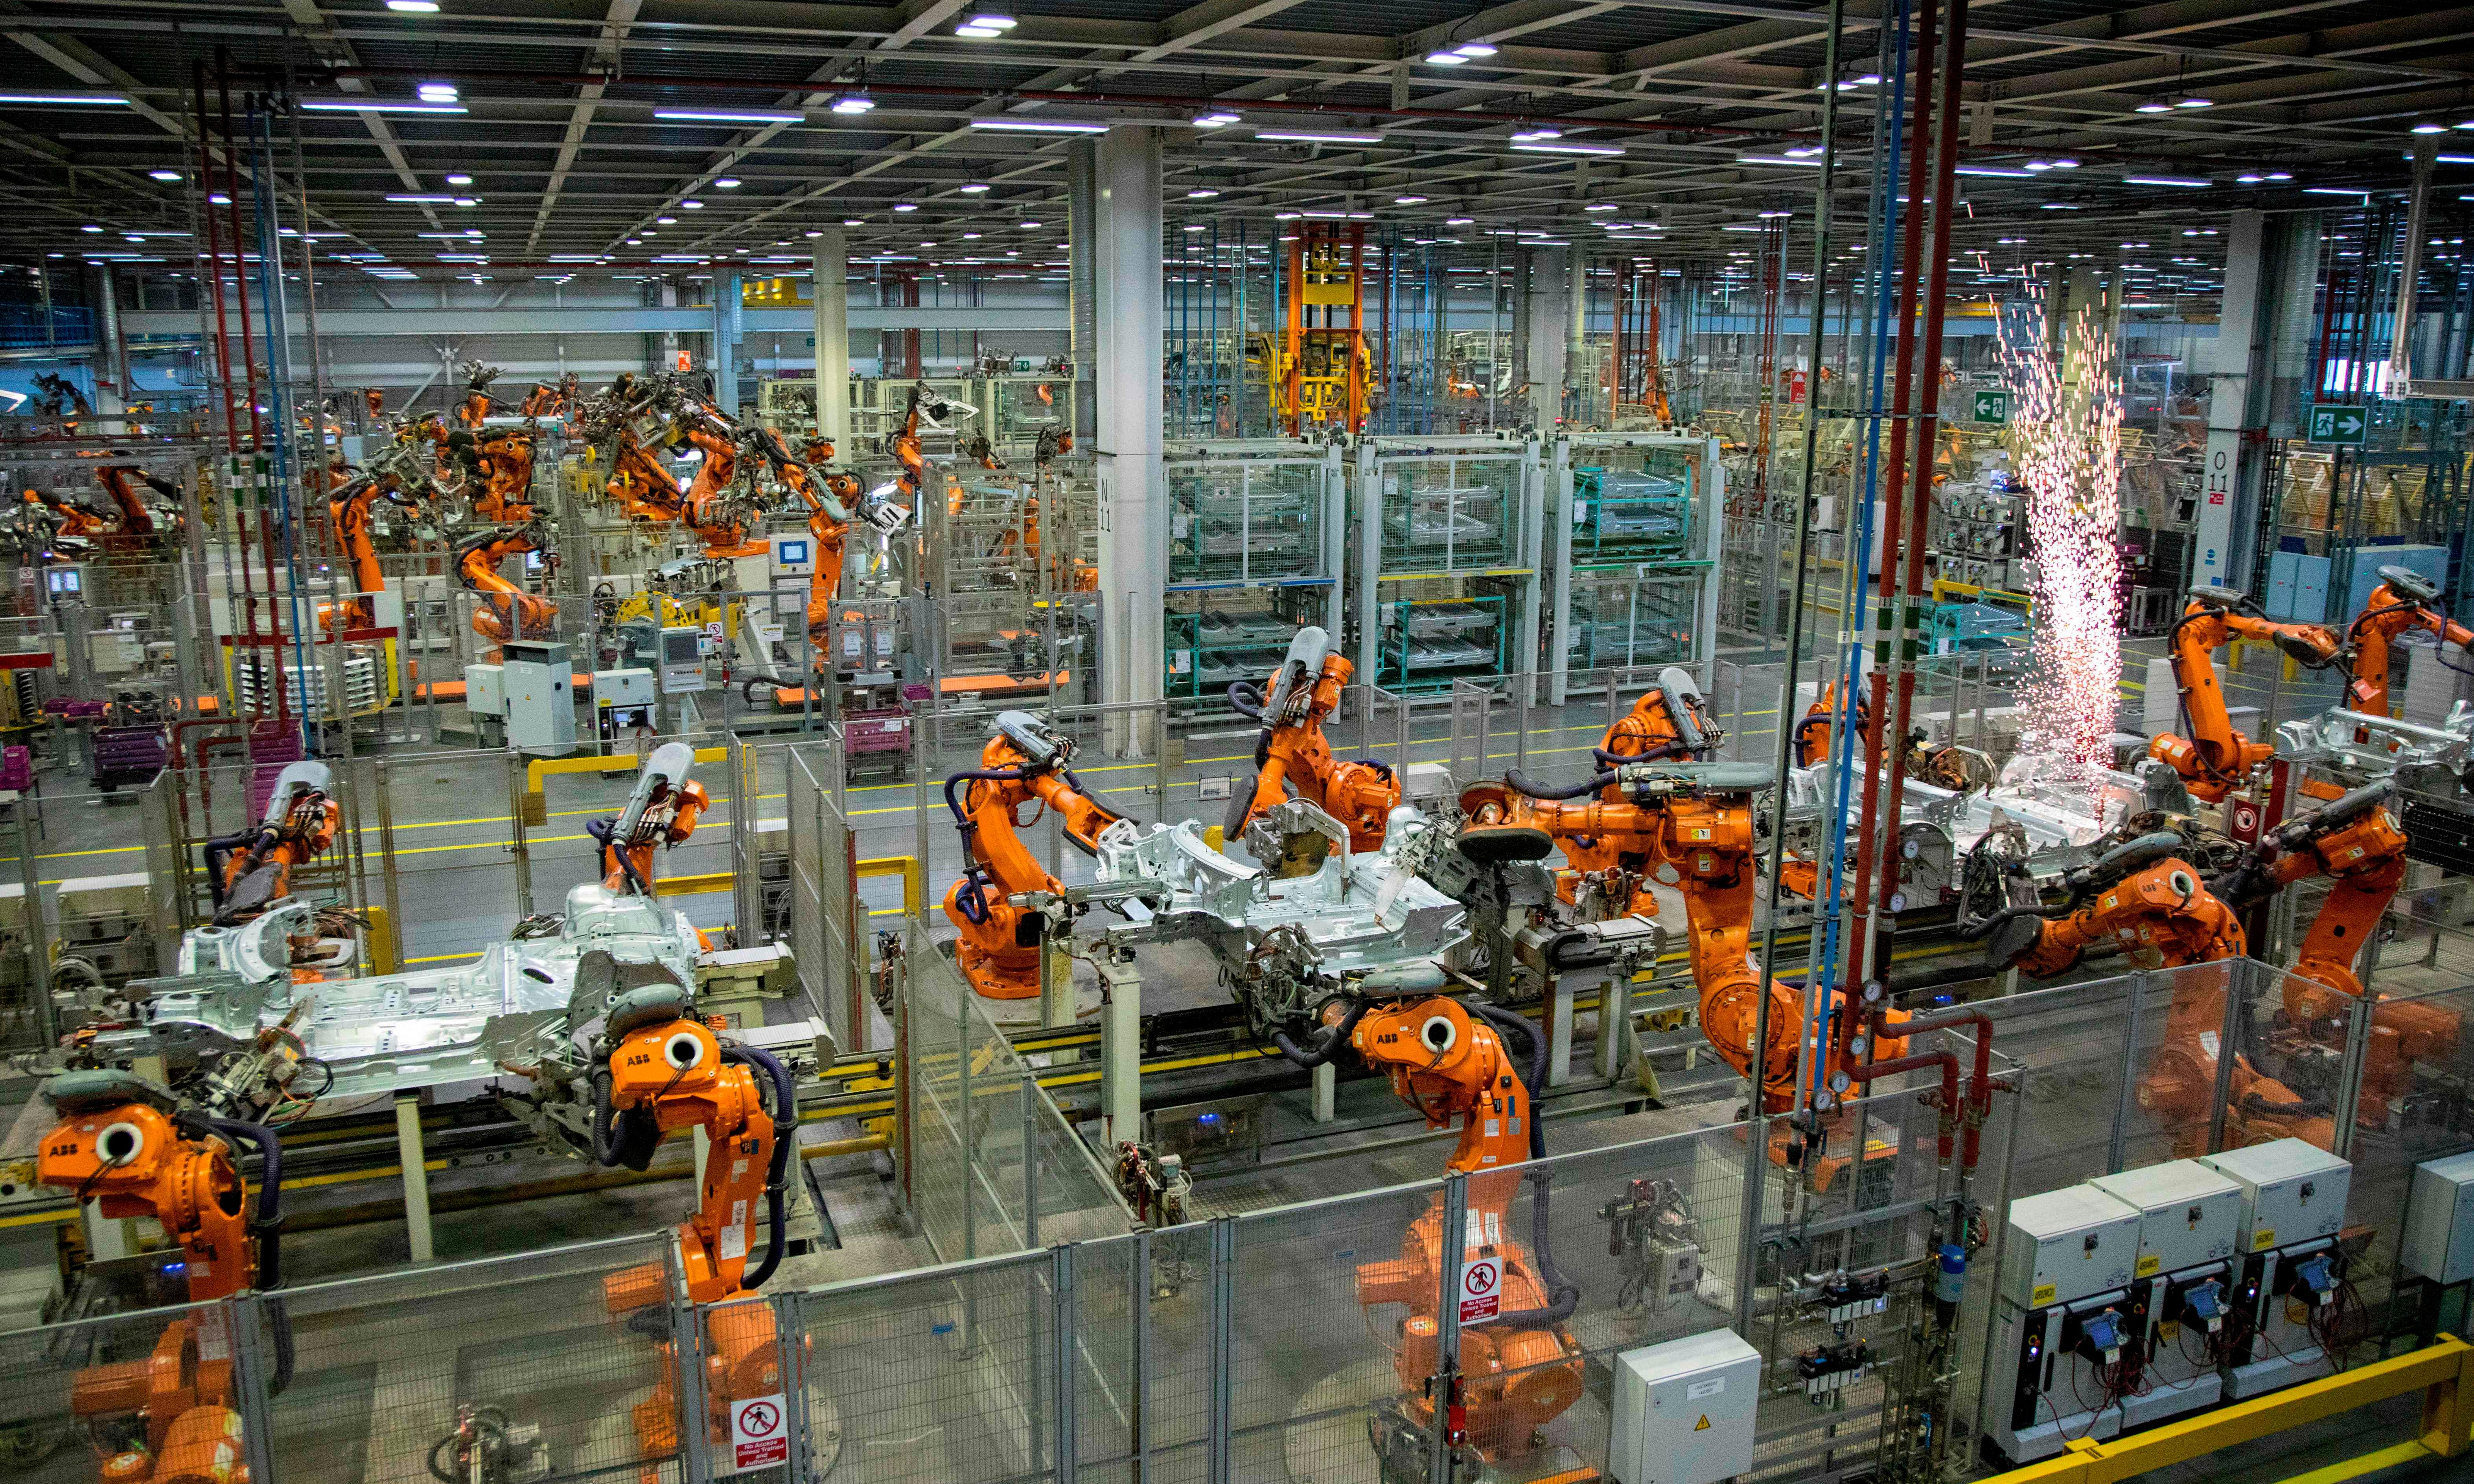 UK economy has 'too few robots', warn MPs